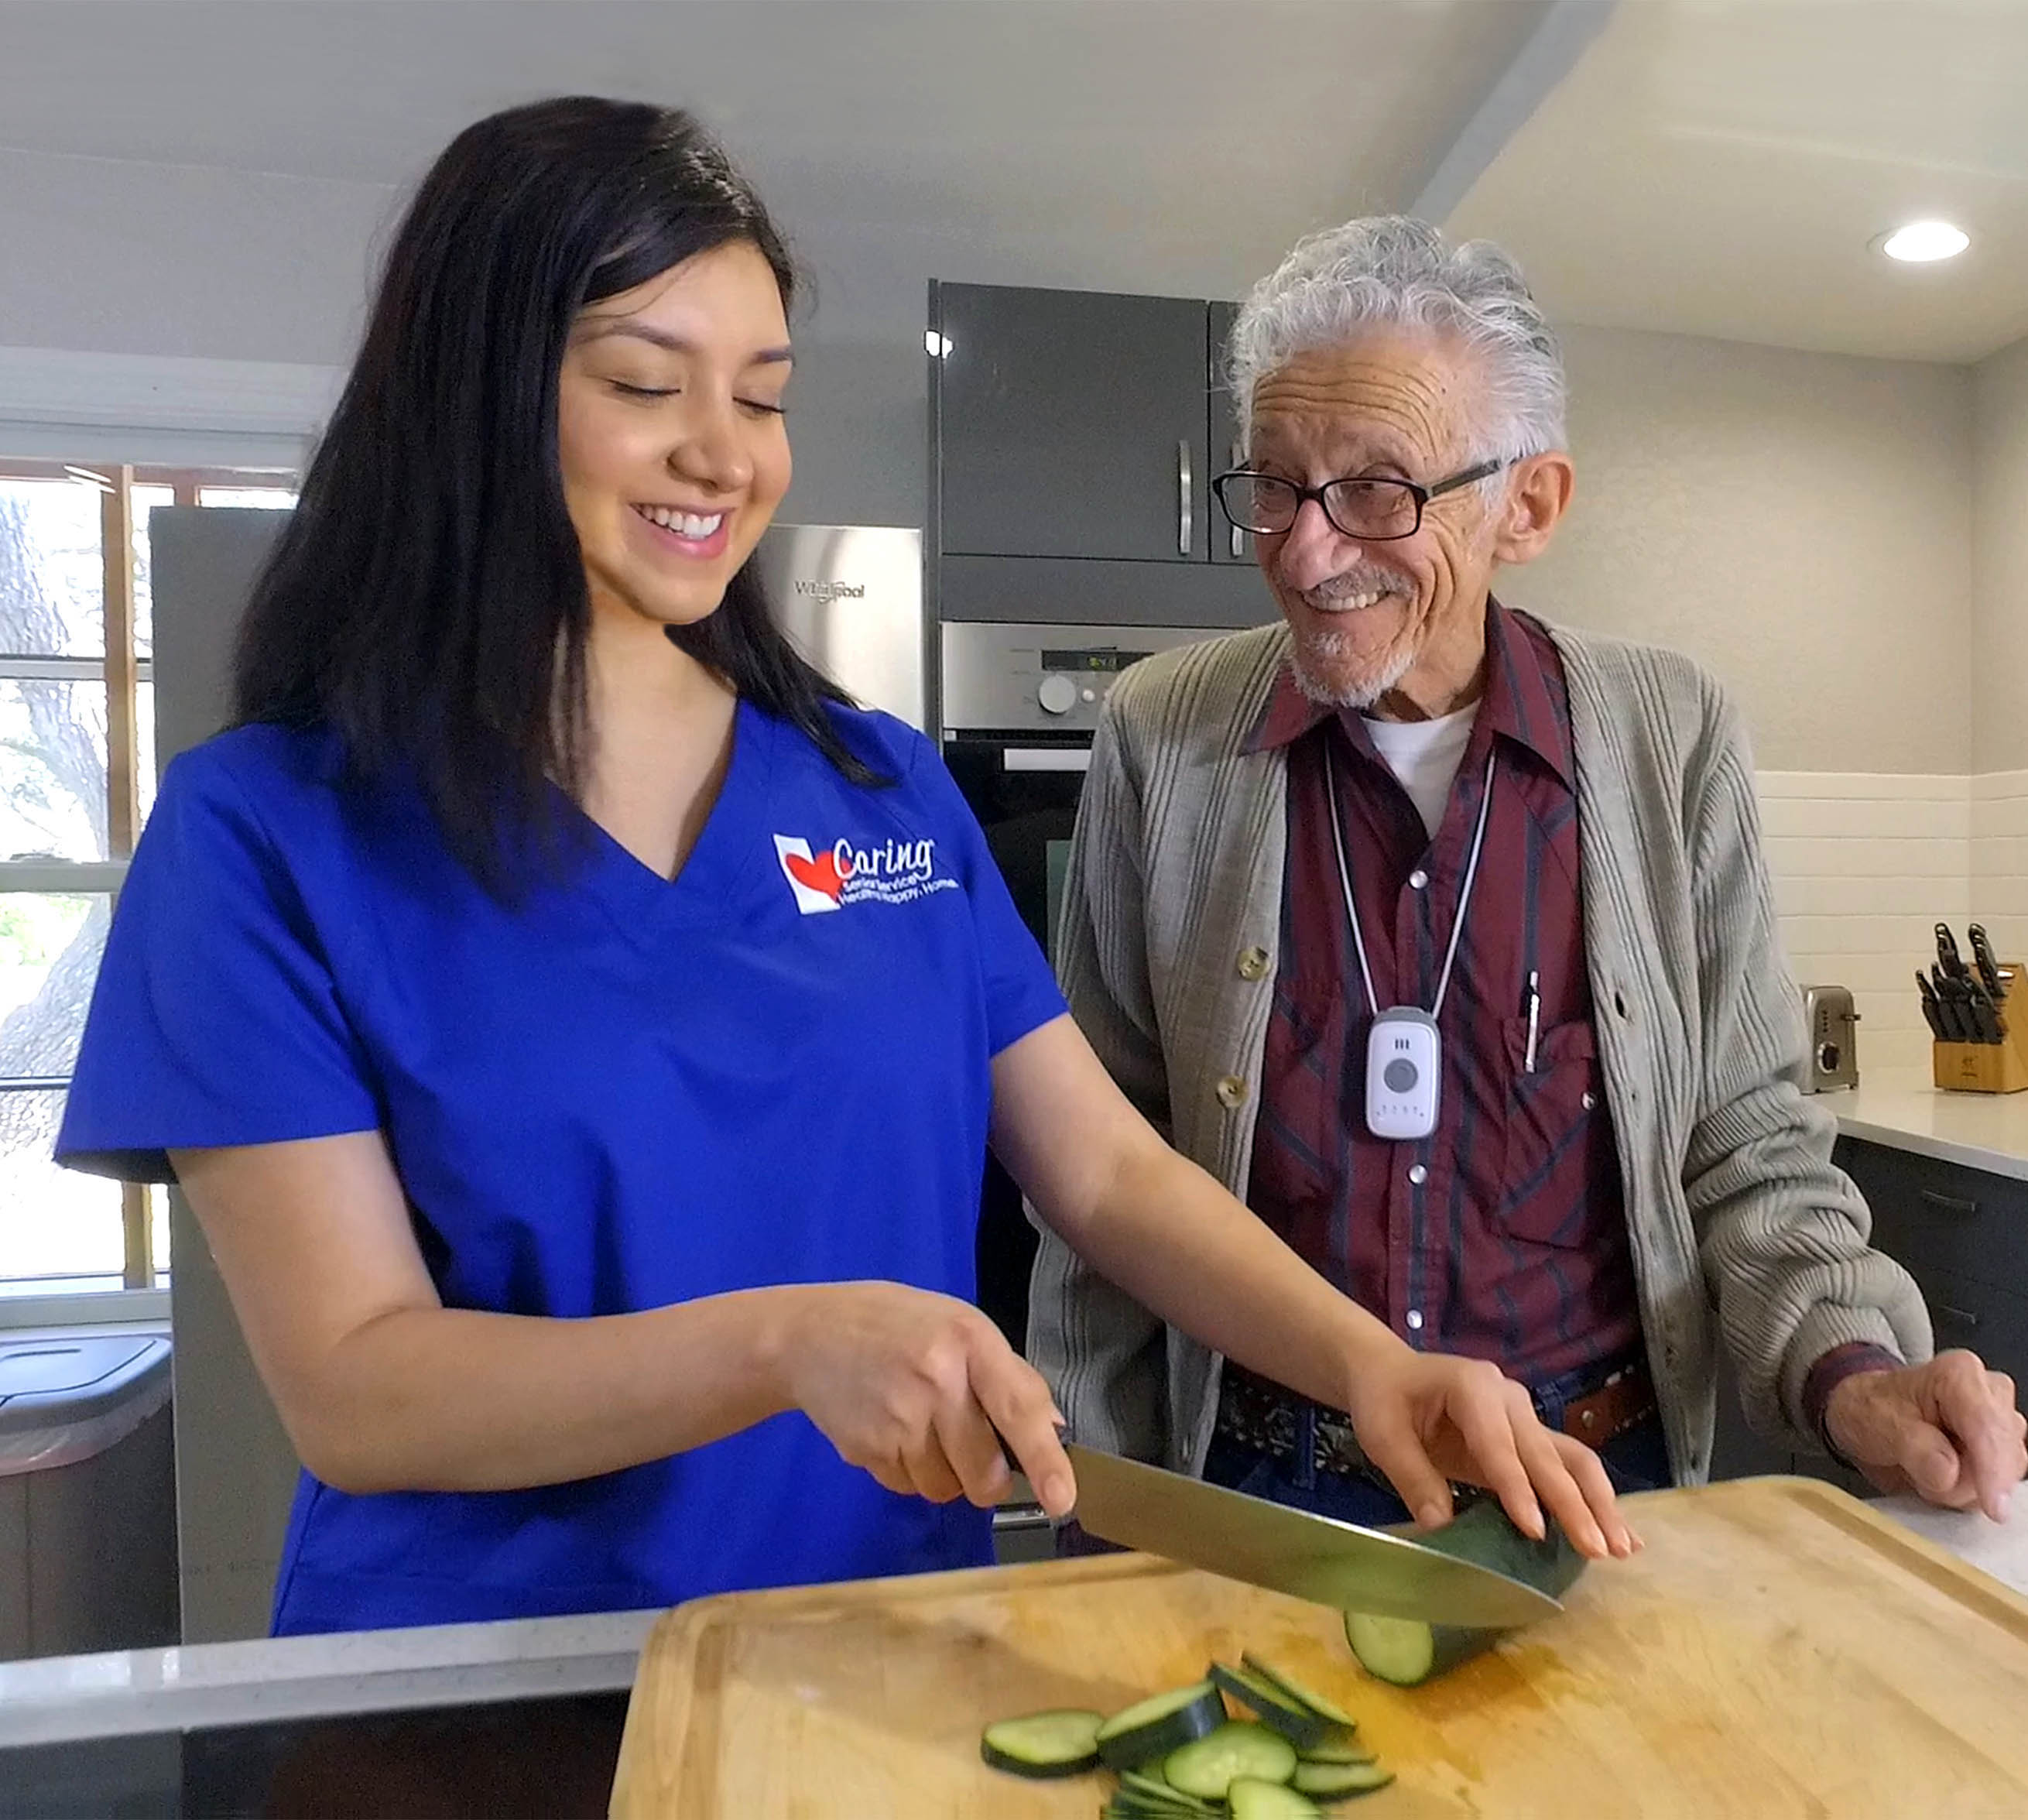 Need Senior Home Care? | Caring Senior Service of Long Island